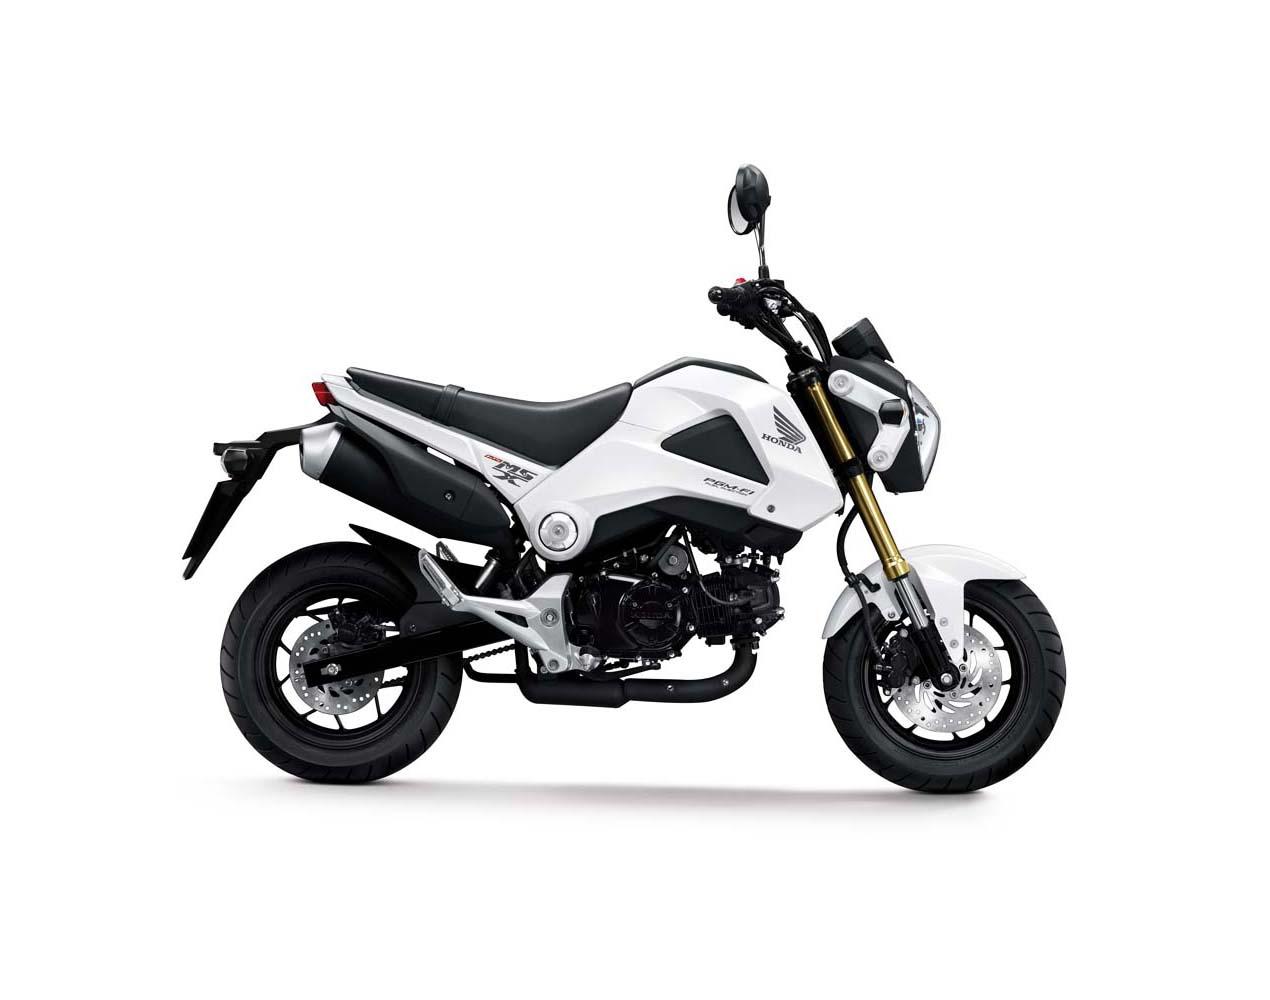 anyone into small motorcycles? honda grom coming soon